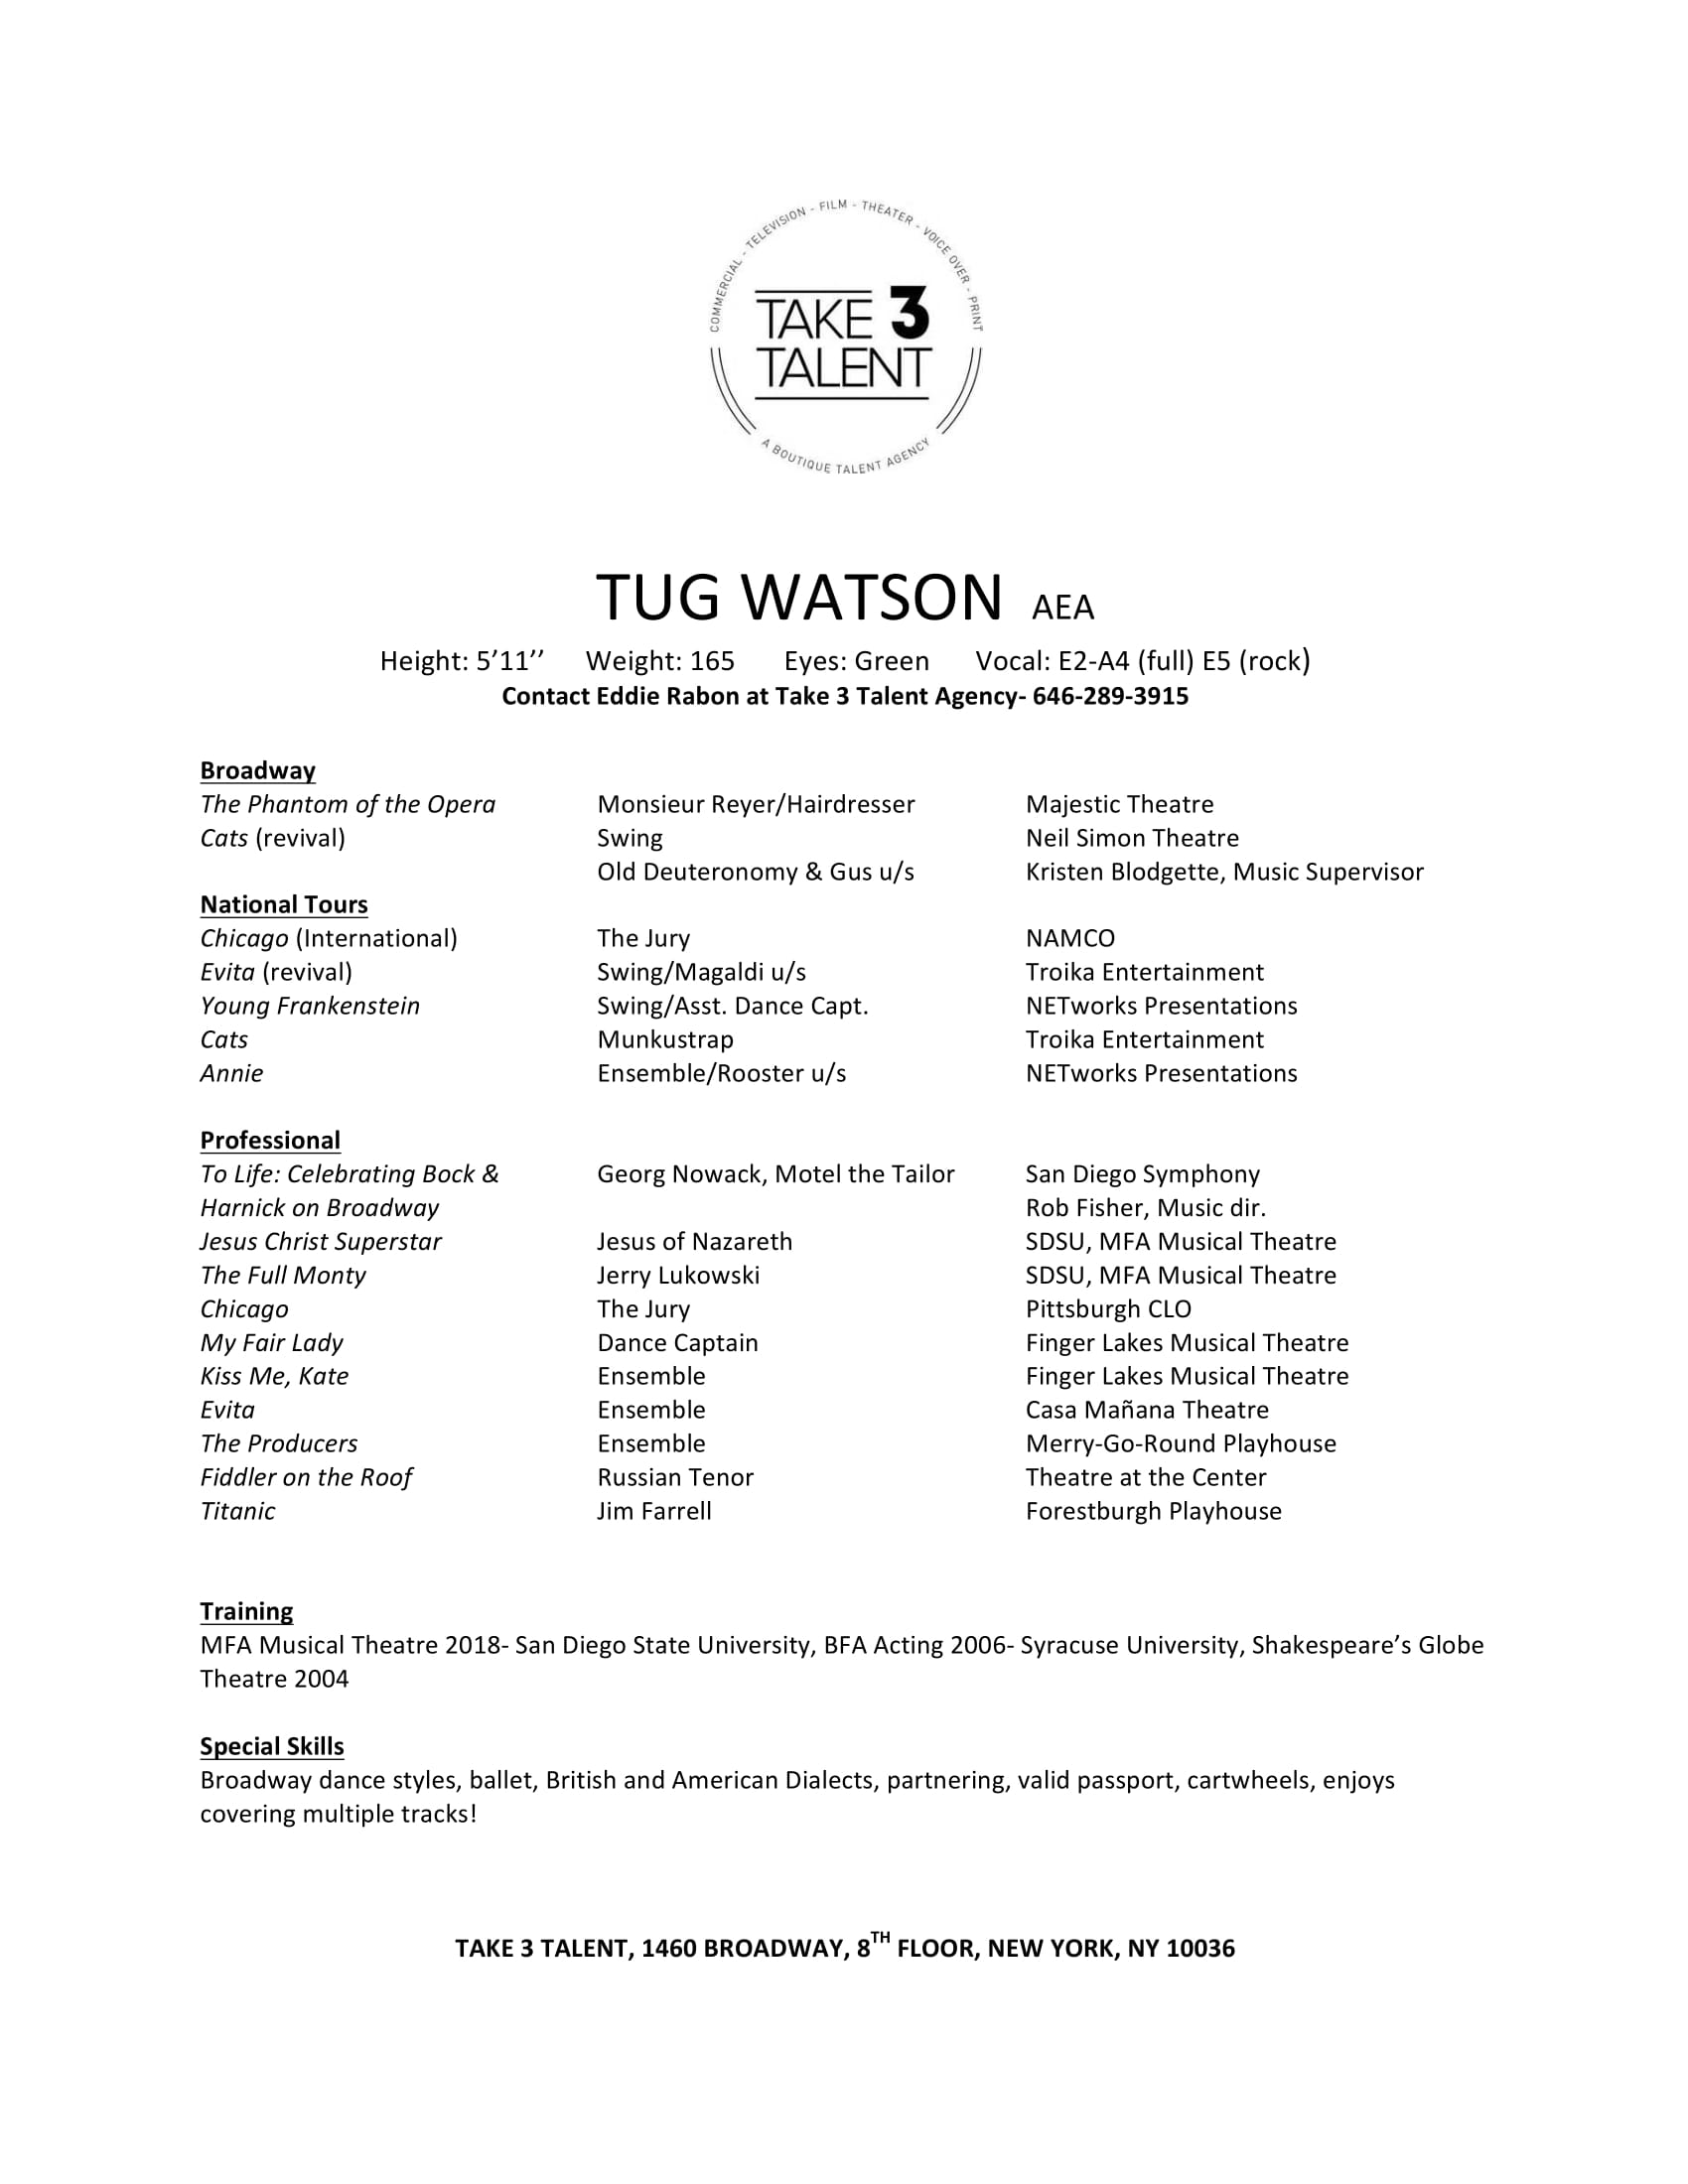 watson resume-1.jpg